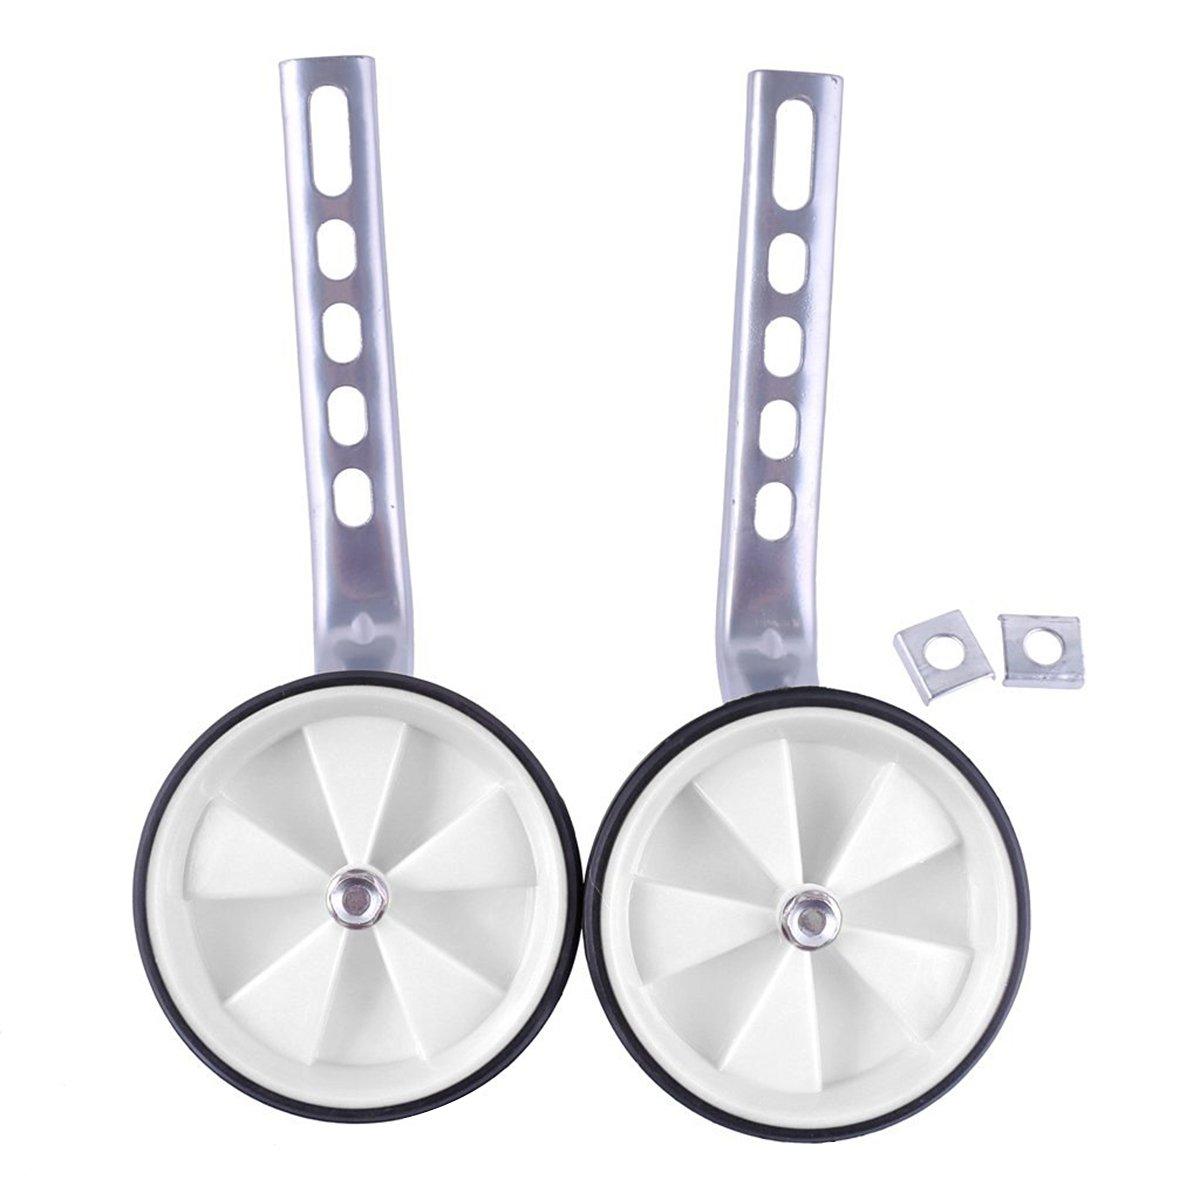 OULII Traing Wheel Kid Bicycle Fittings Bike Wheel Kit Universal Kids Bike Kit Fits 12''-20'' Bicycles(White)